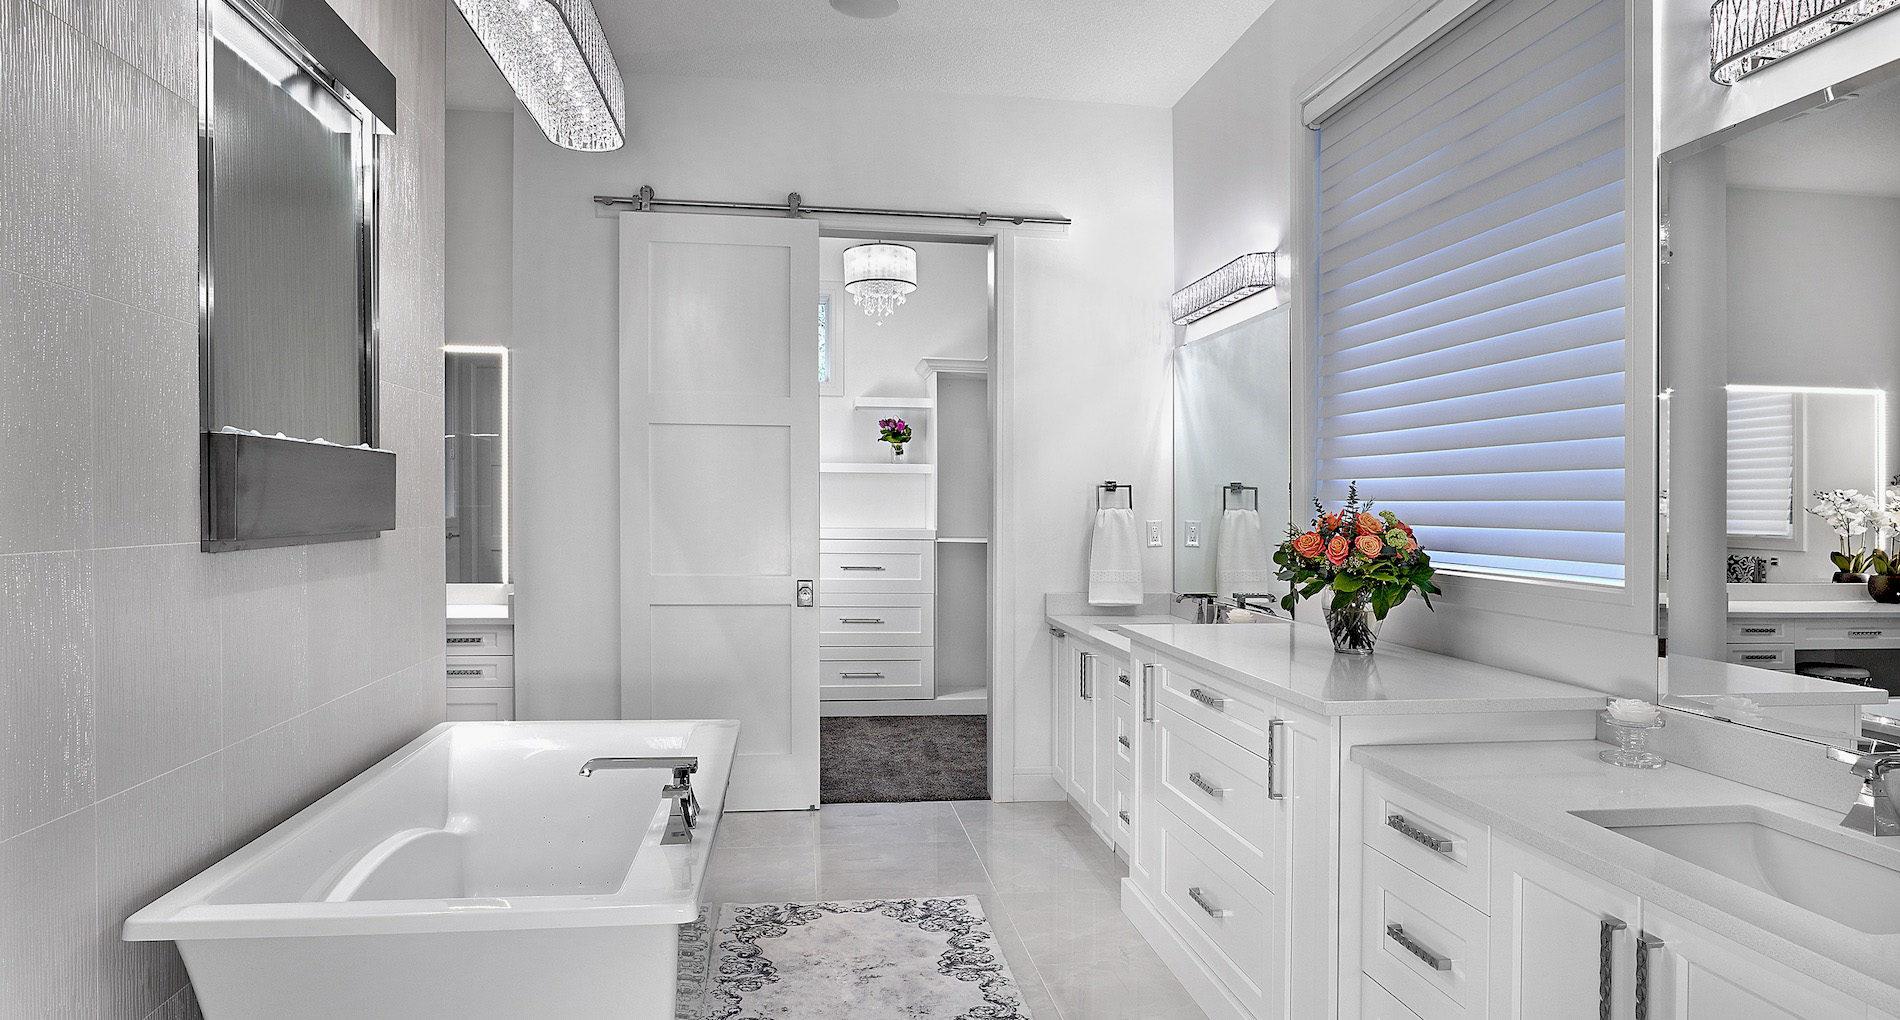 Bathroom Renovation North Island Scondale Slider